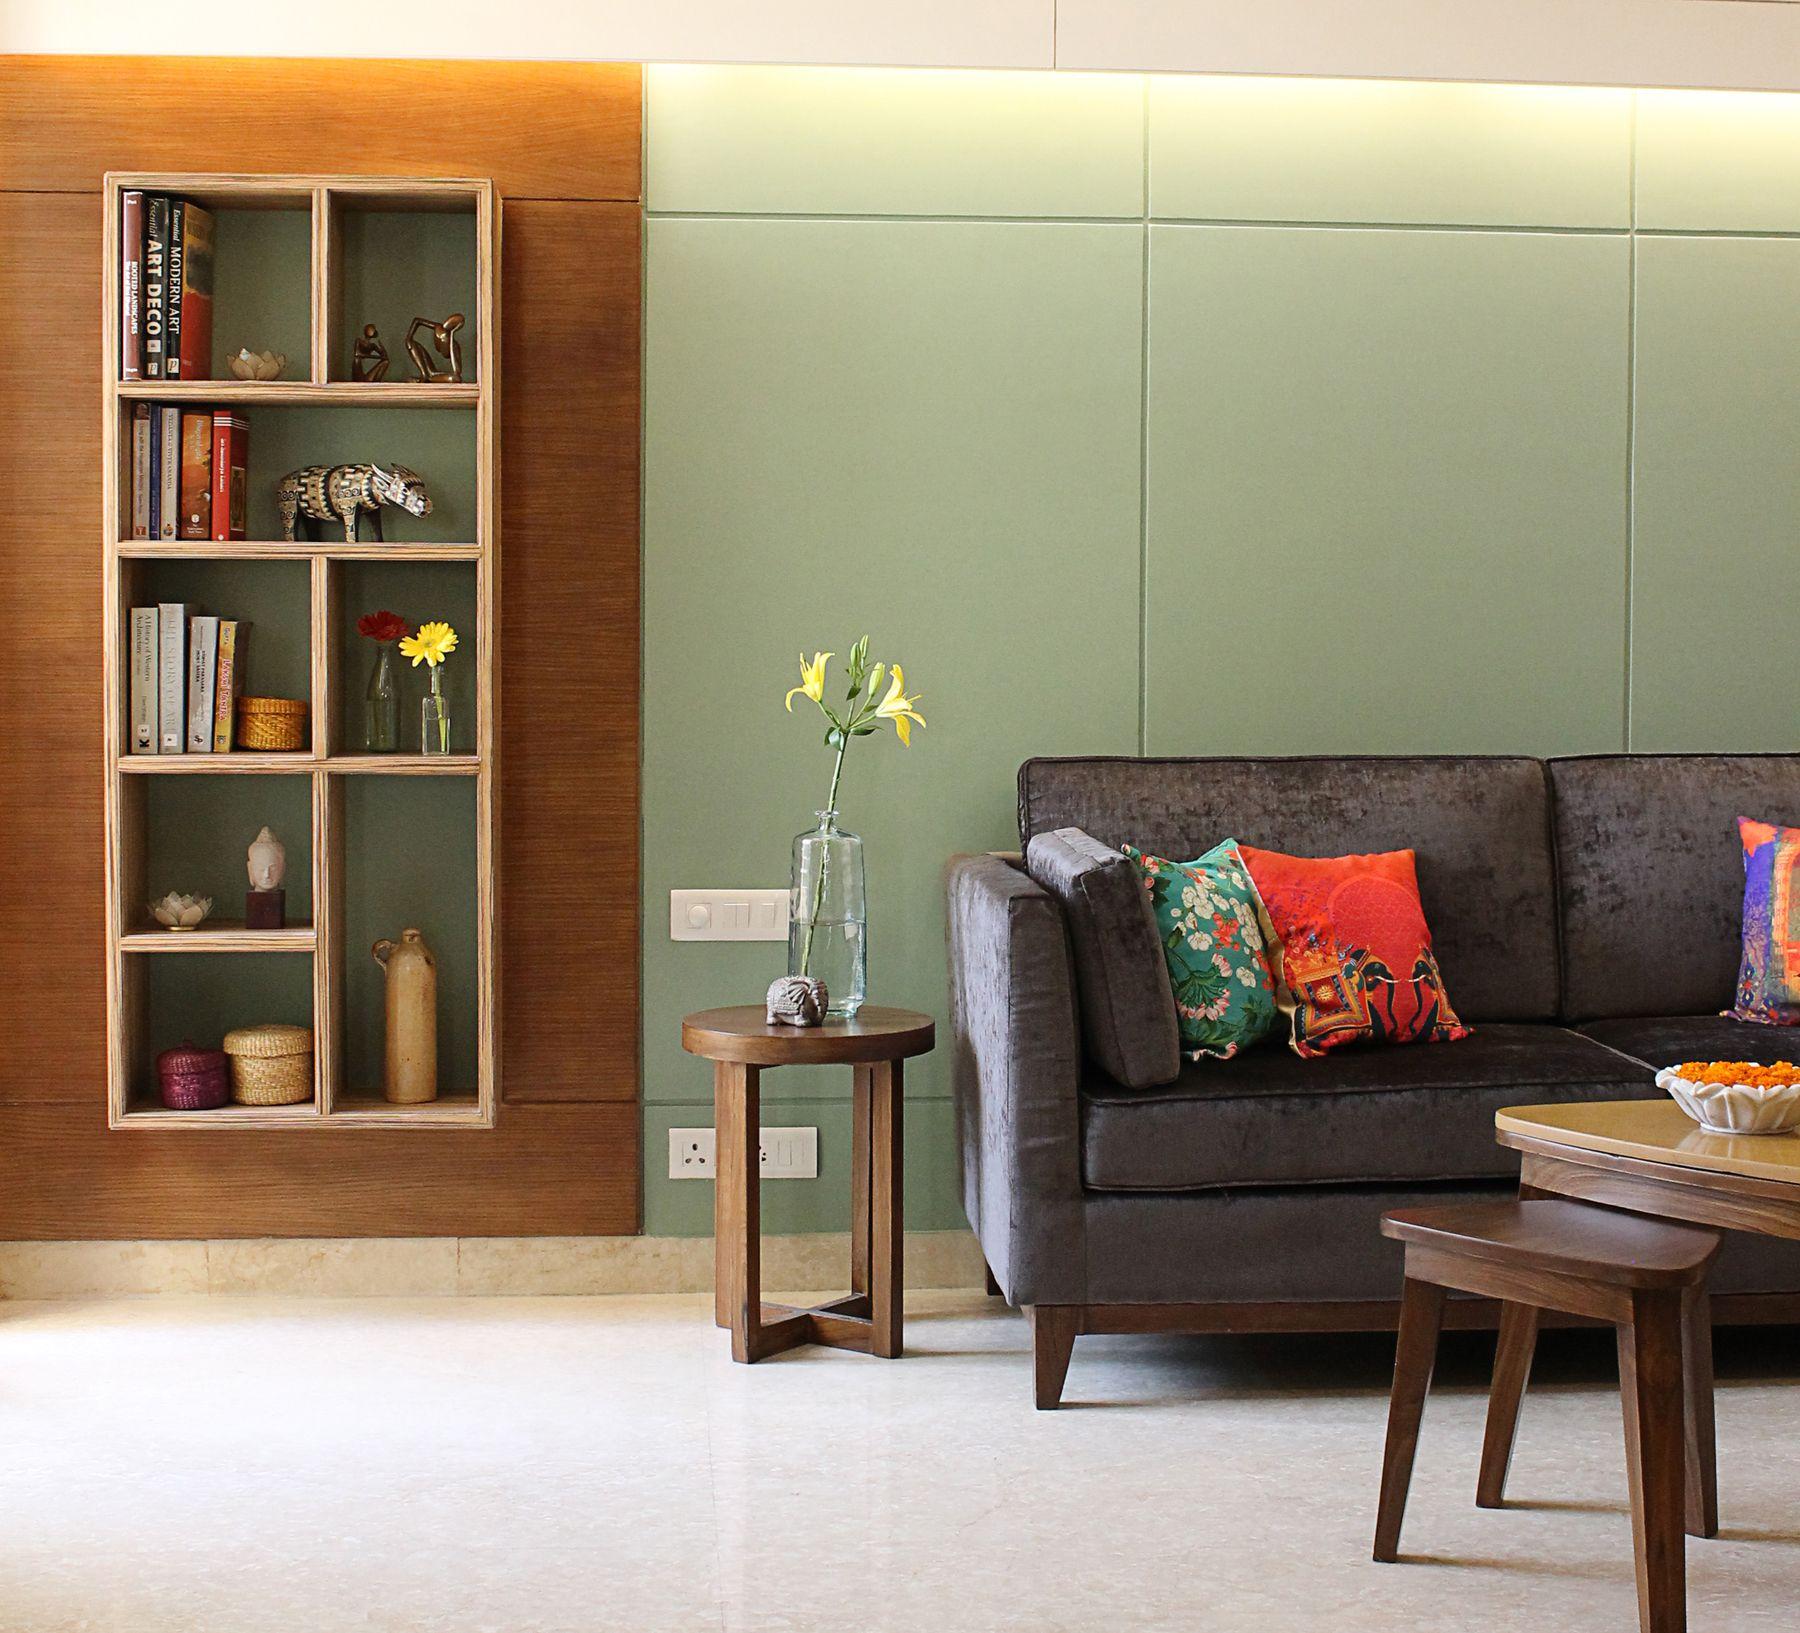 Home interior design gurgaon book shelf in living room spda interior design studio gurgaon  my